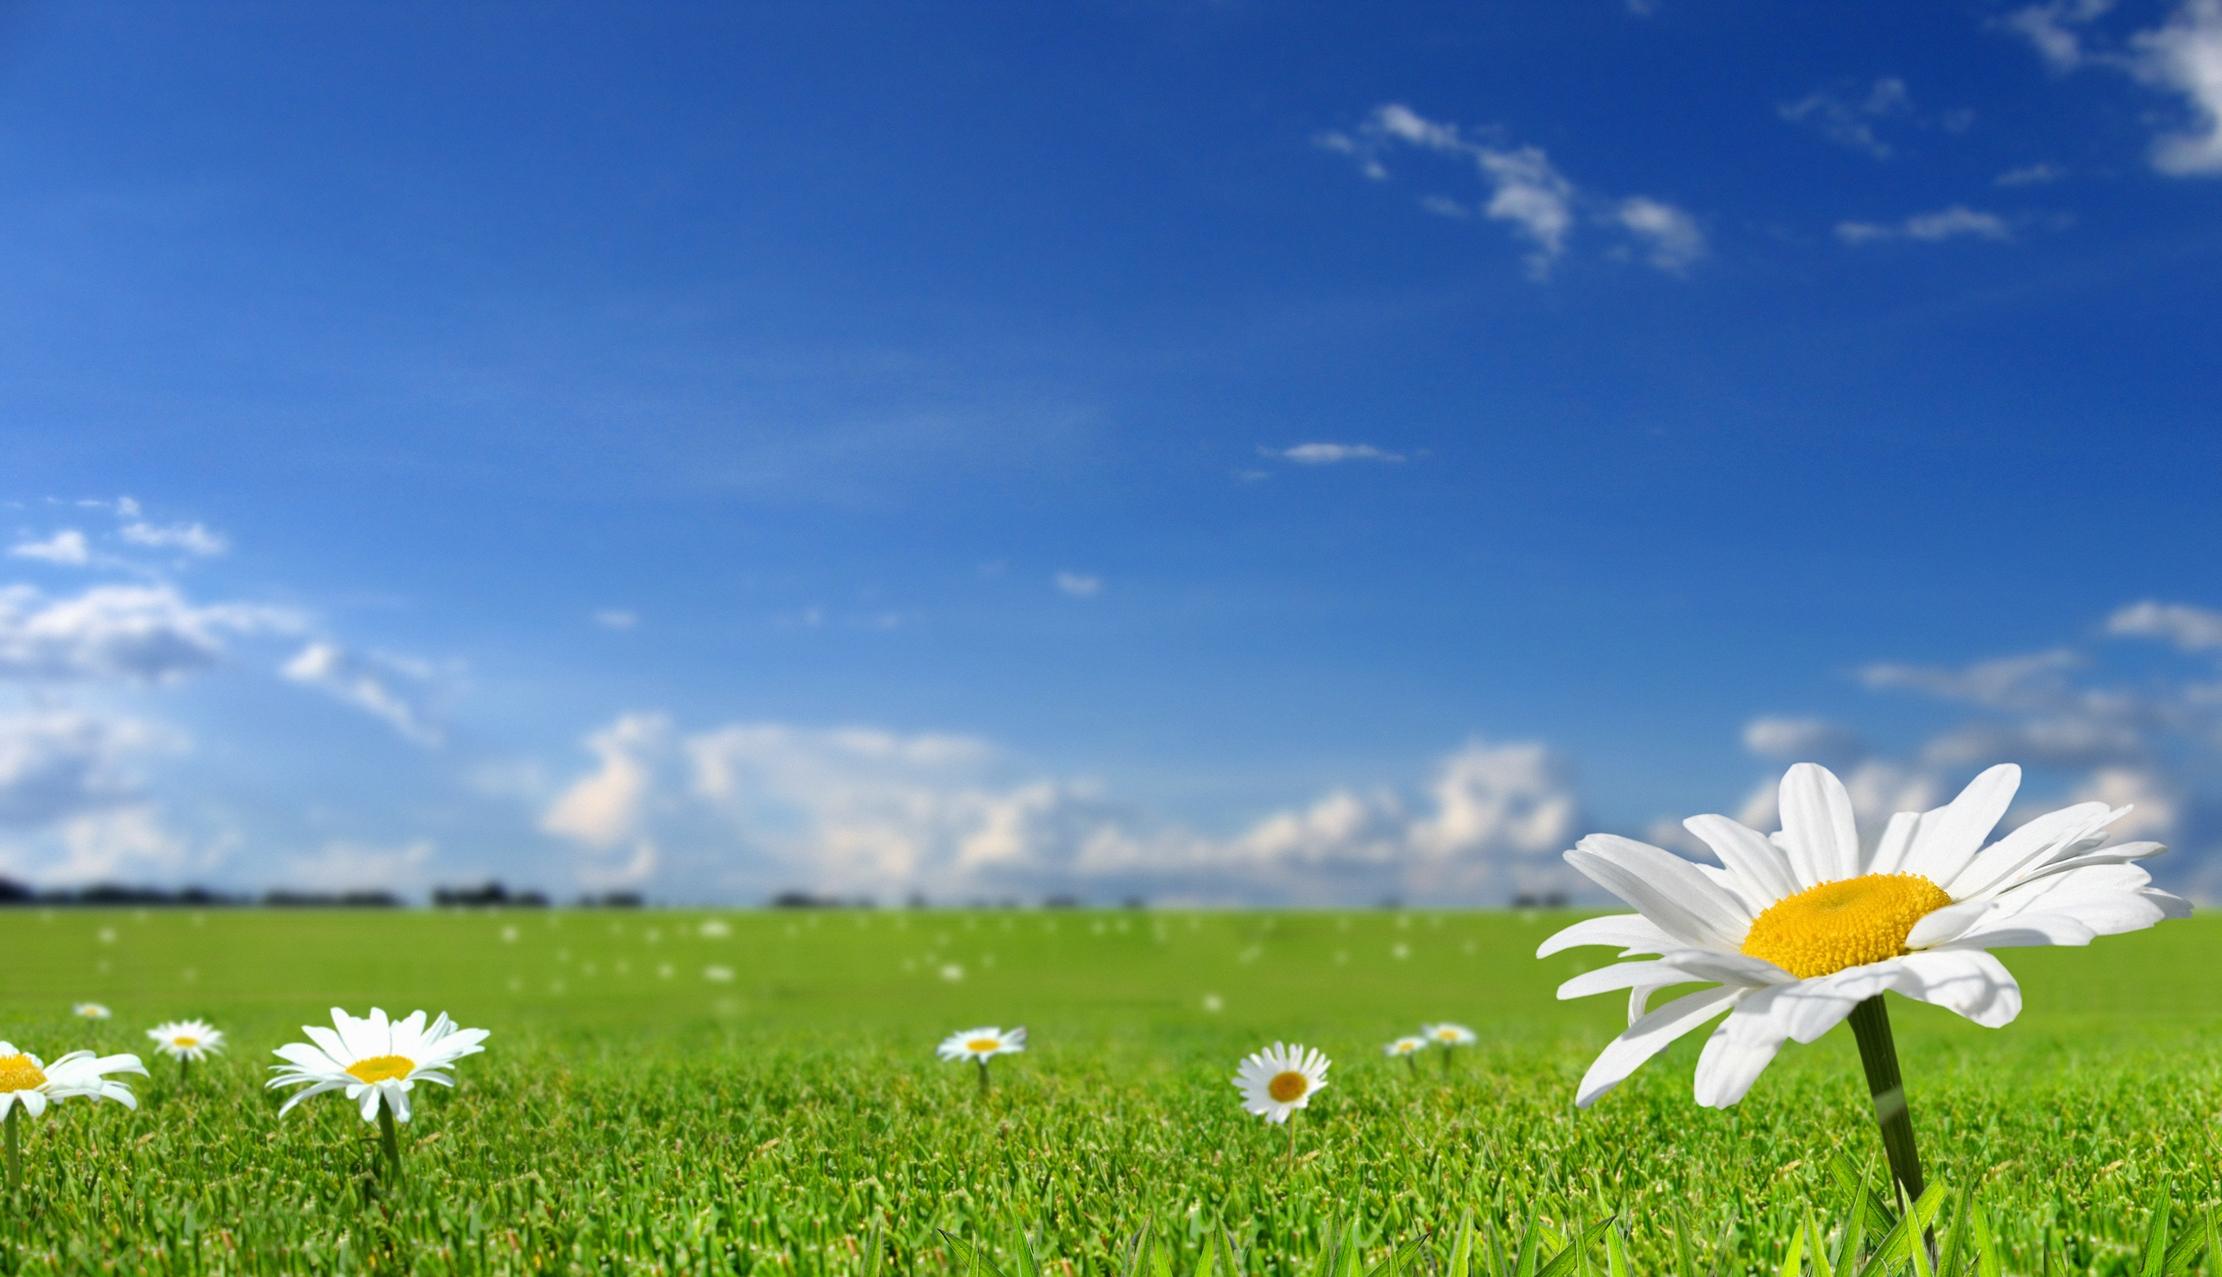 Wallpaper : Chamomile, field, sky, nature, Sun, grass ...